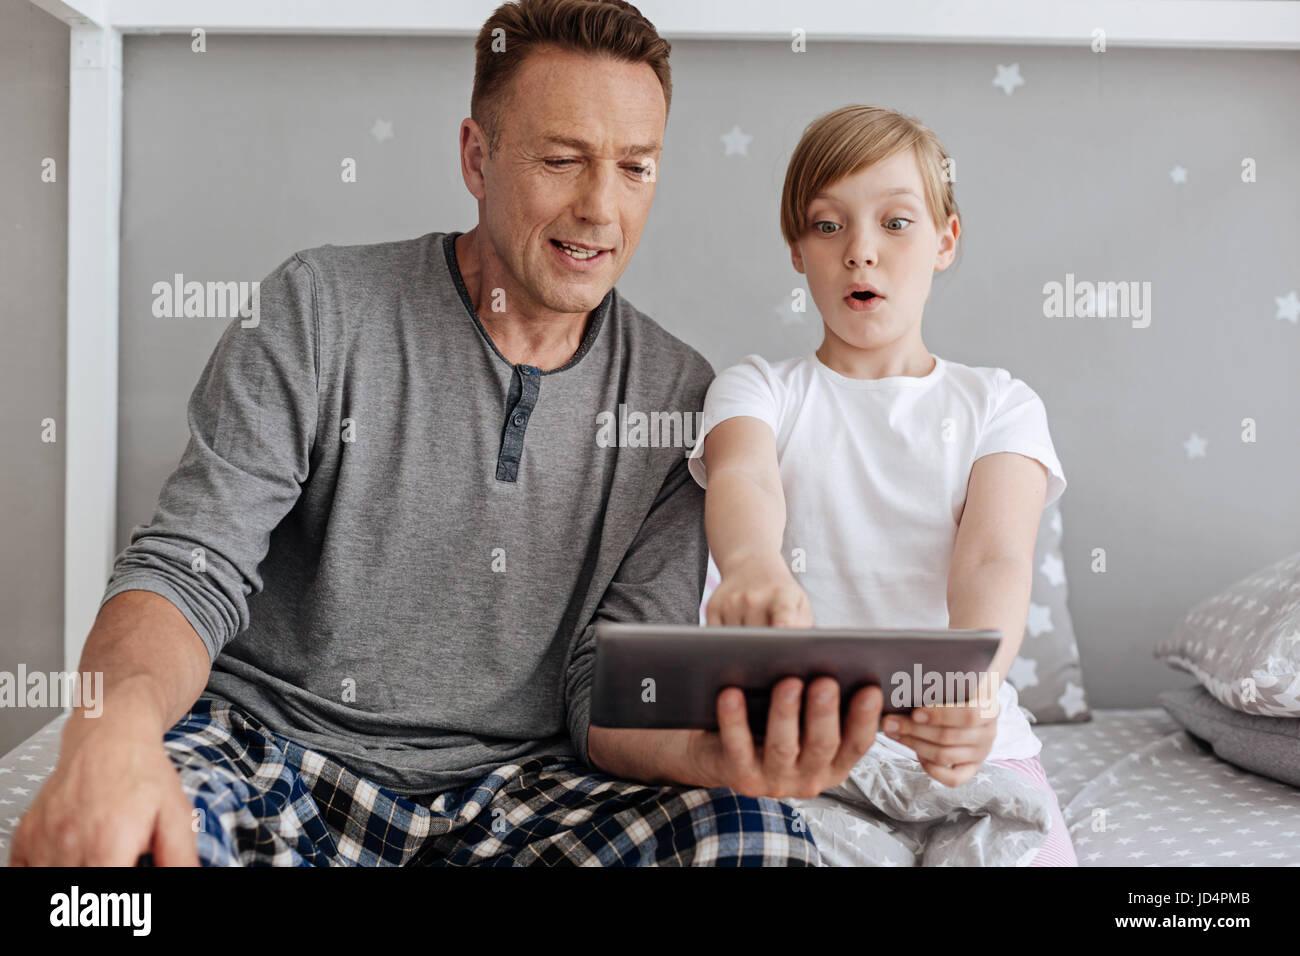 Hell begeistert Kind zeigte auf dem tablet Stockbild